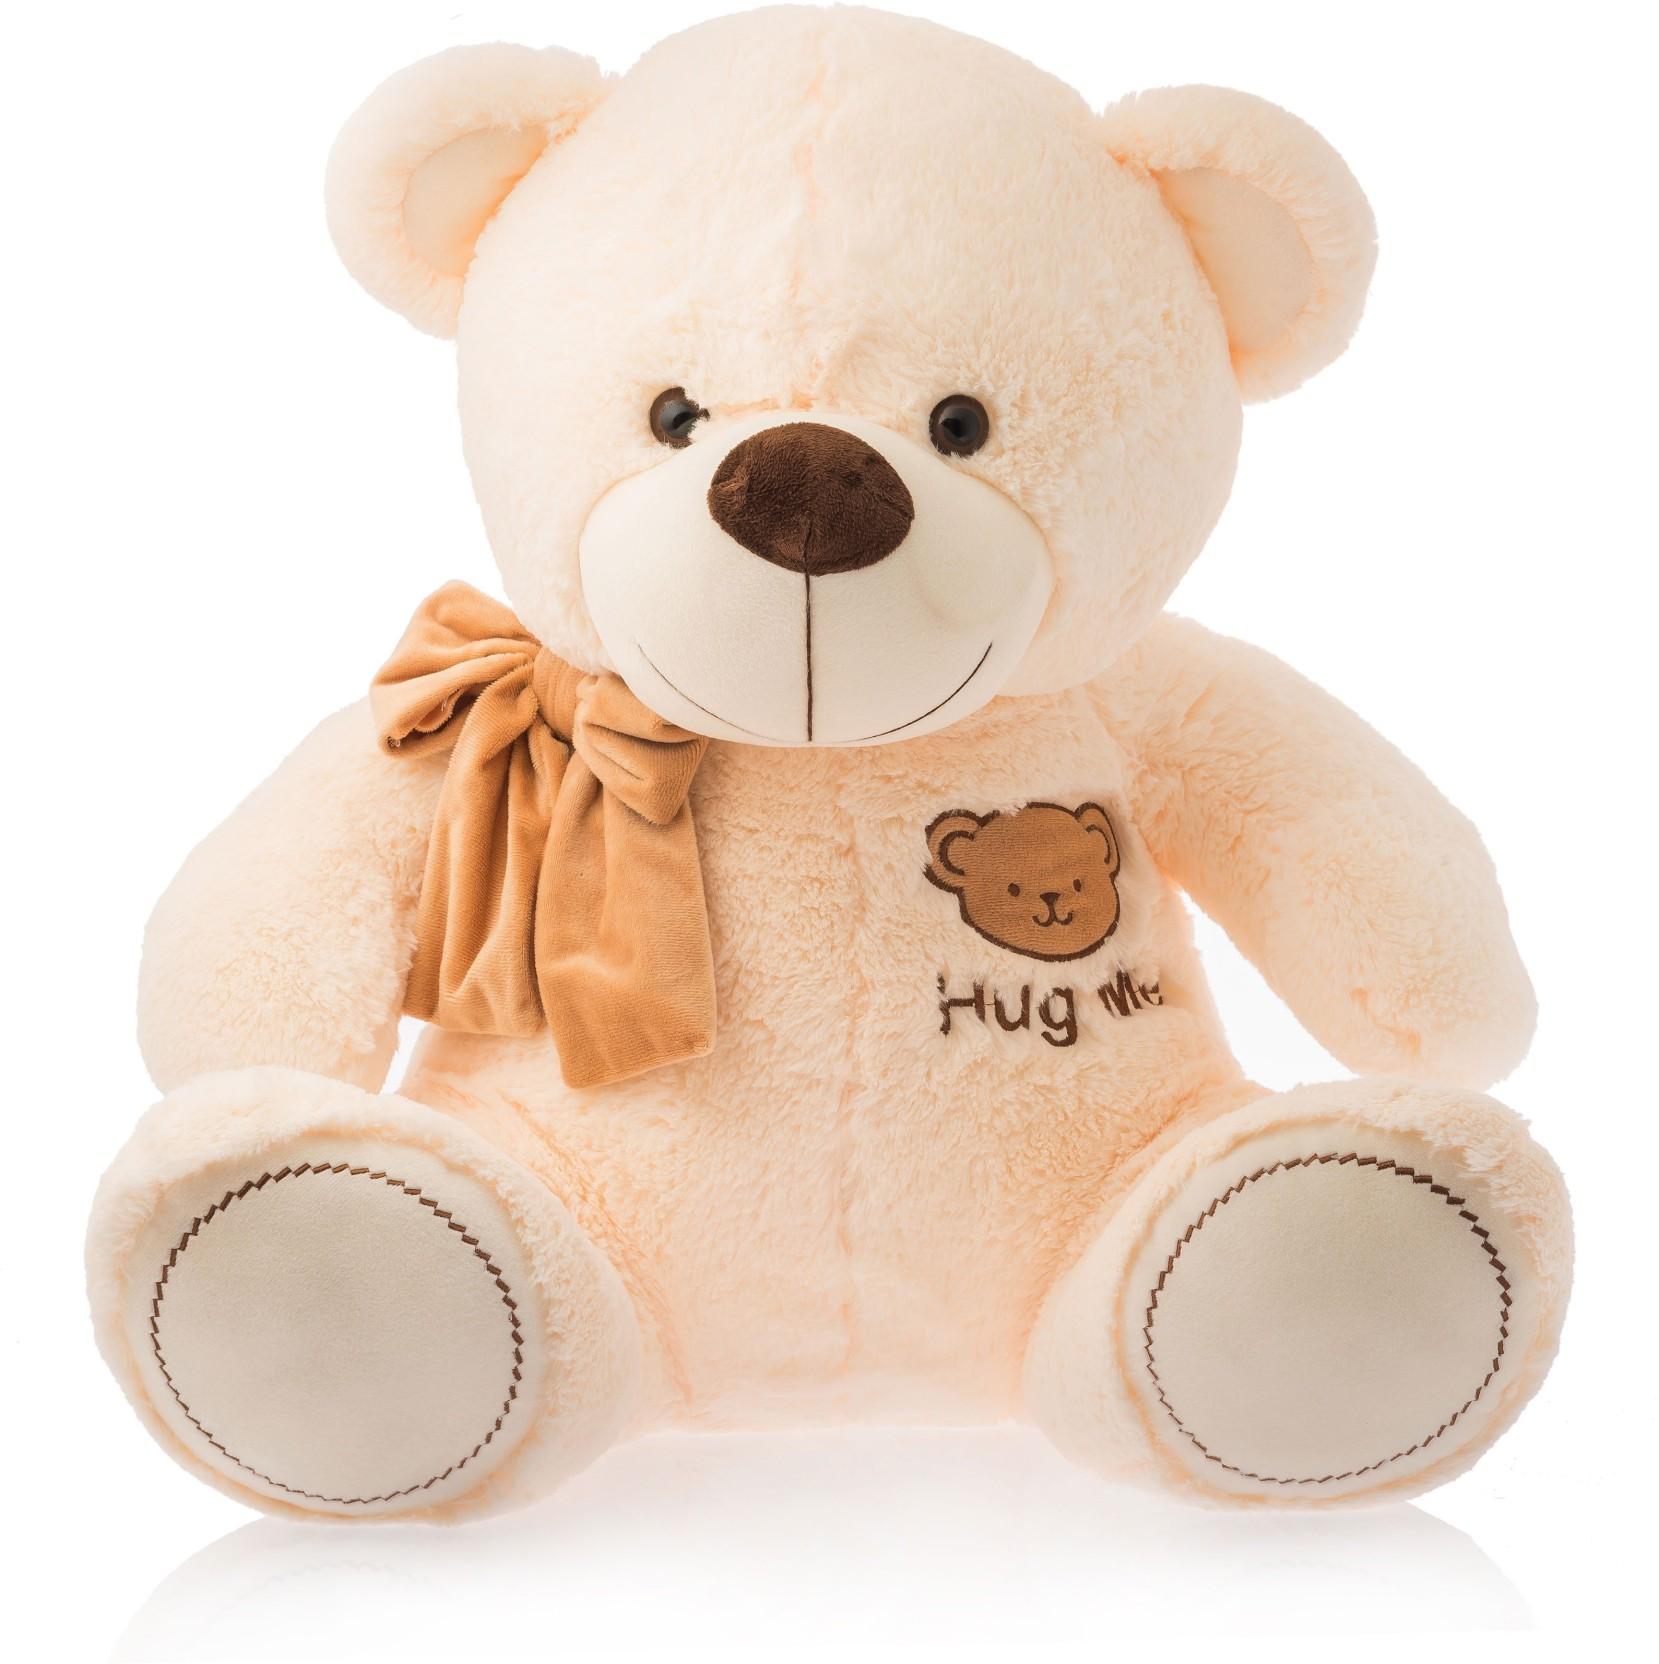 Dimpy Stuff Bear W Hug Me Emb Cream 50 Cm Cuddle Pajamas Red The Angry Birds Movie Add To Cart